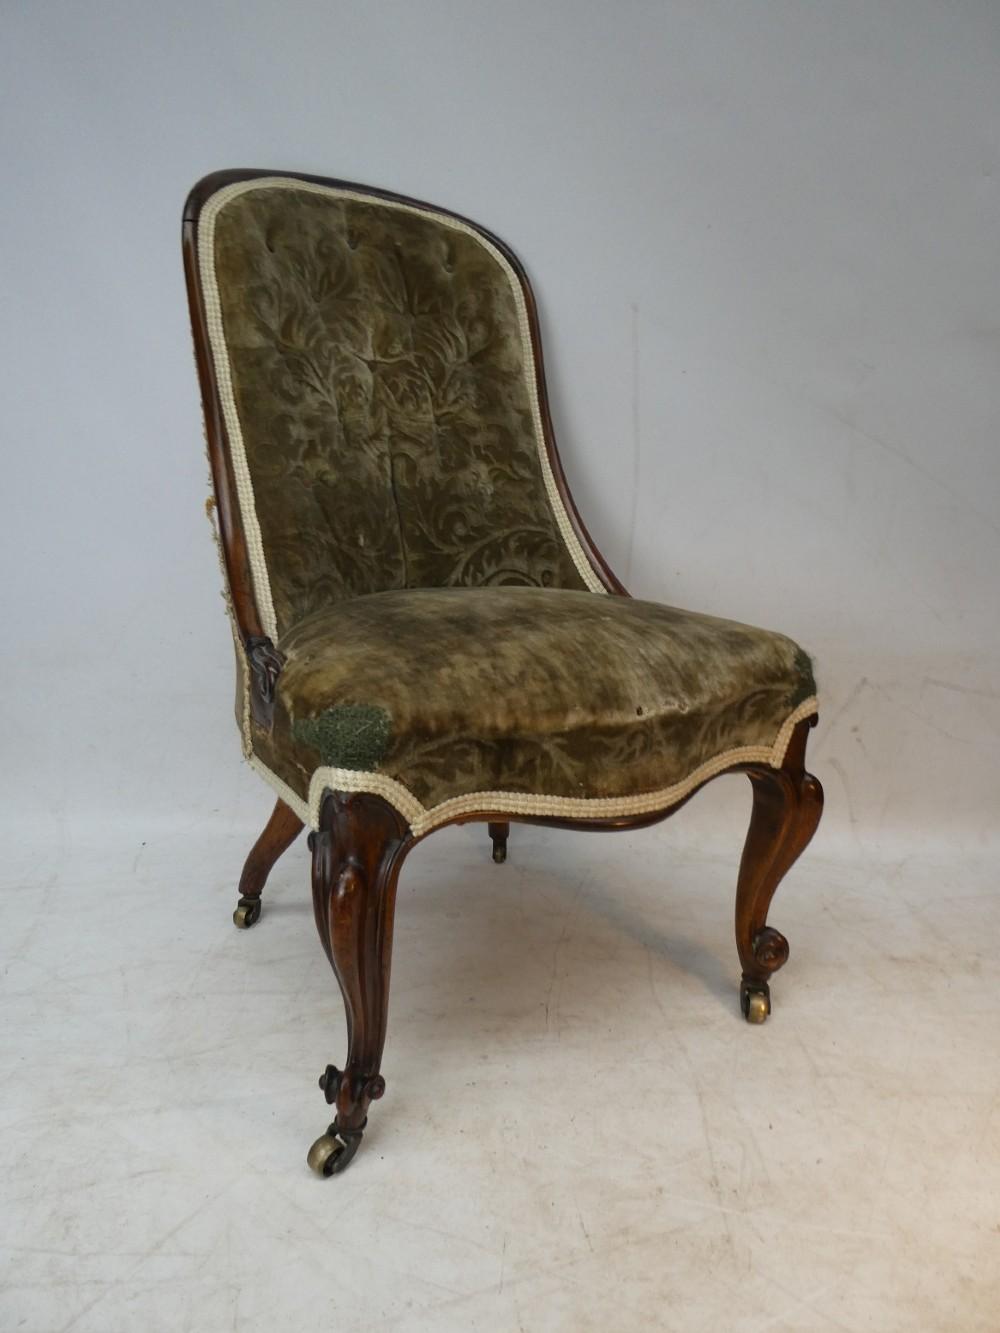 19thc rosewood slipper chair